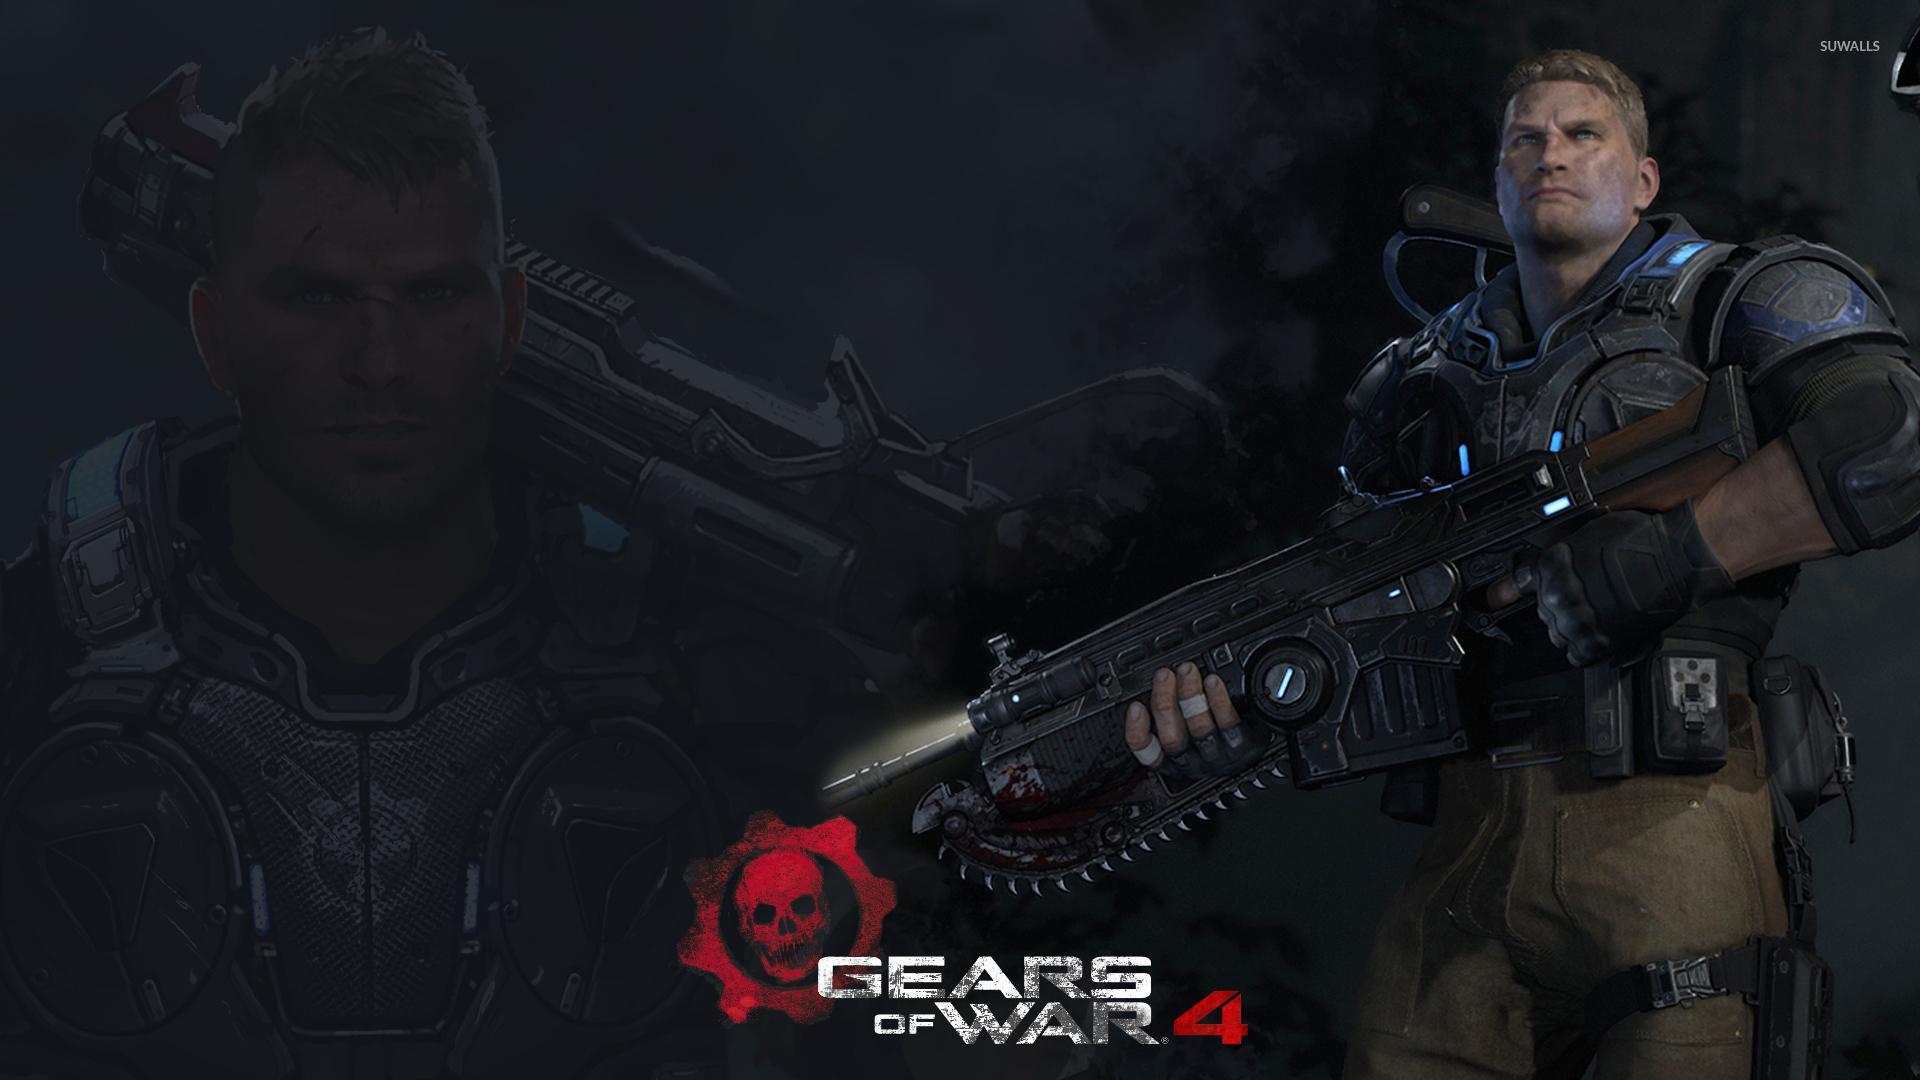 Jd In Gears Of War 4 Wallpaper Game Wallpapers 52881